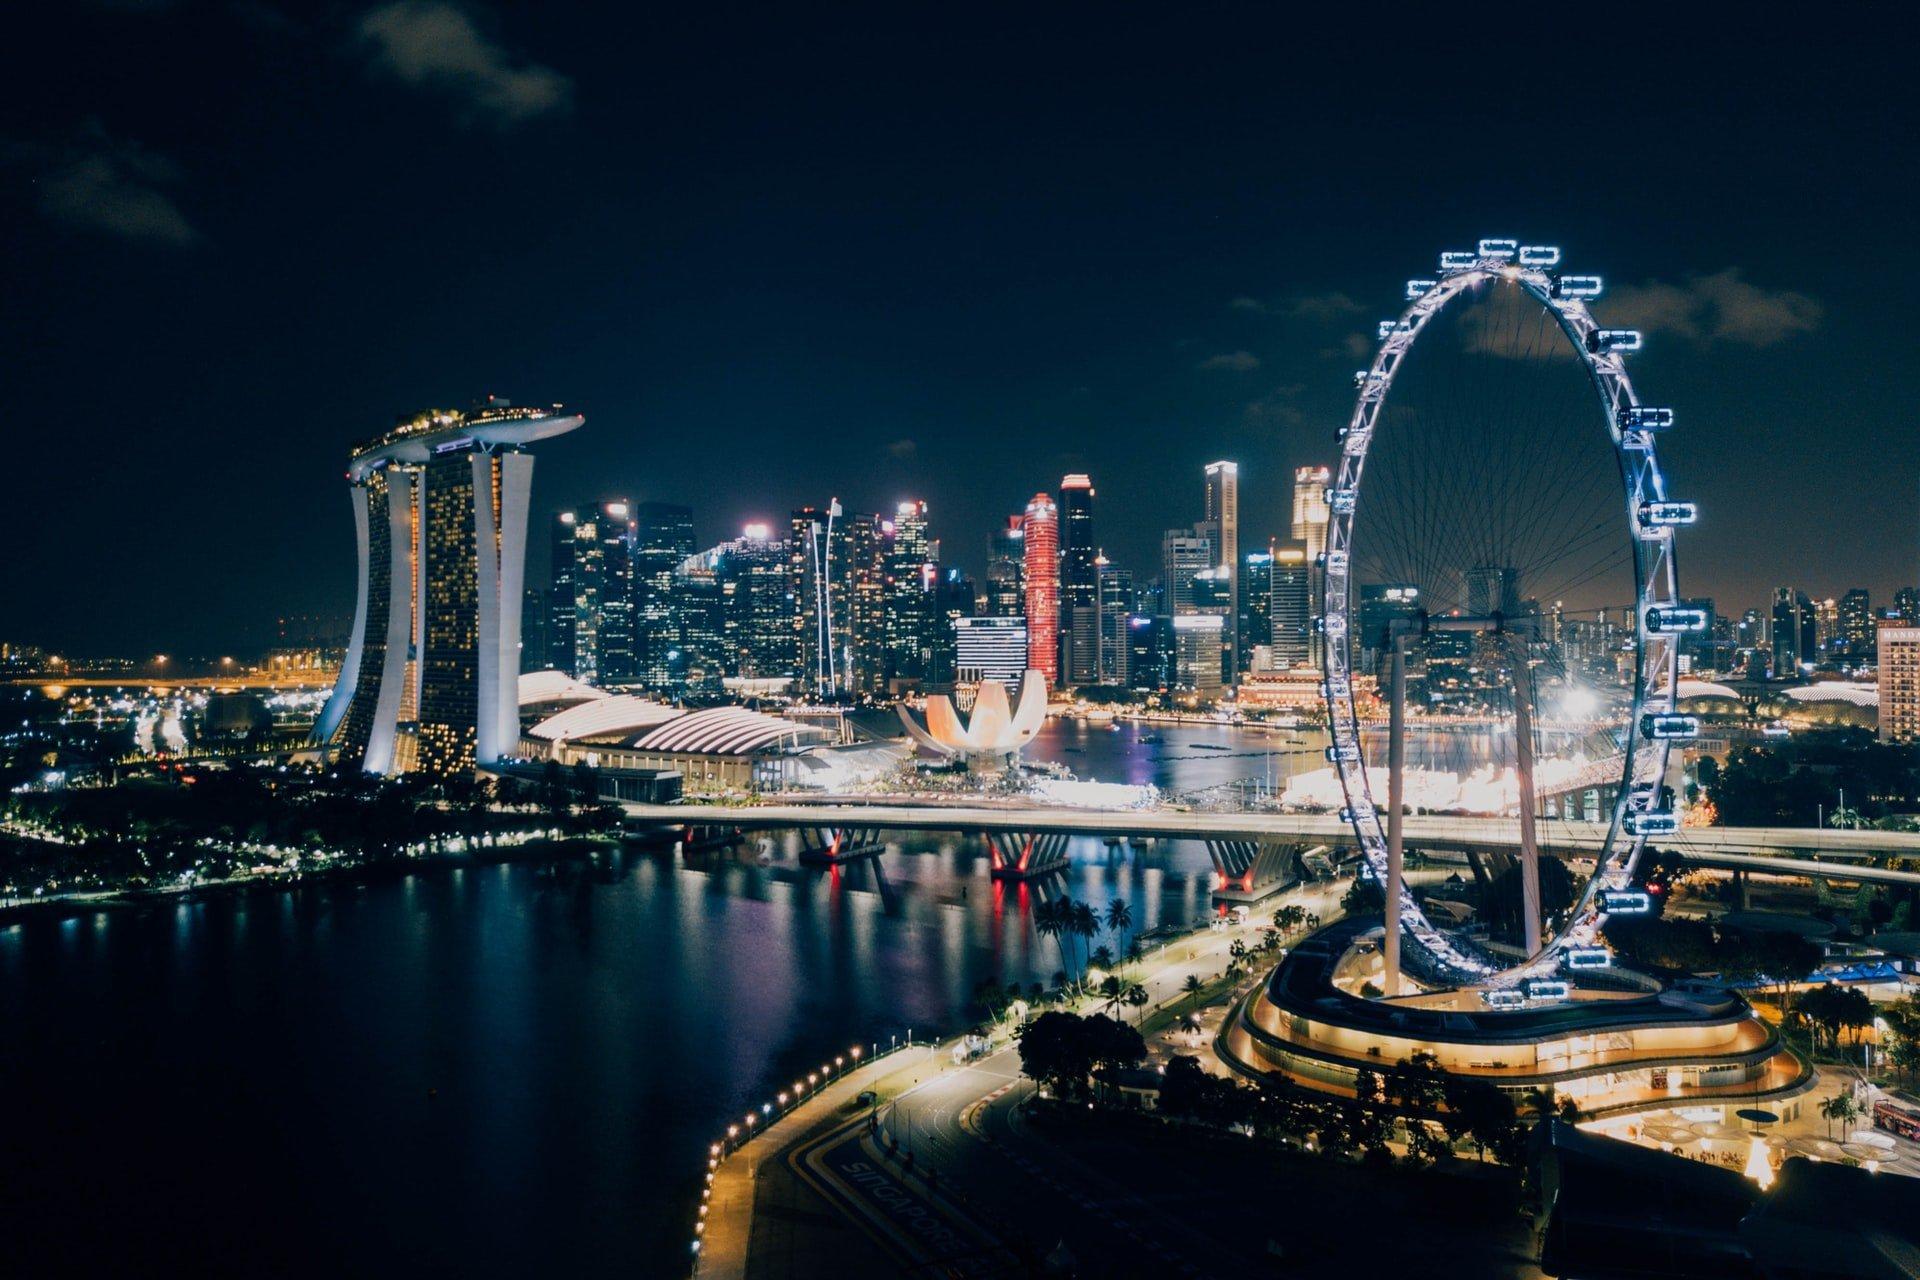 -Singapore Flyer, Singapore